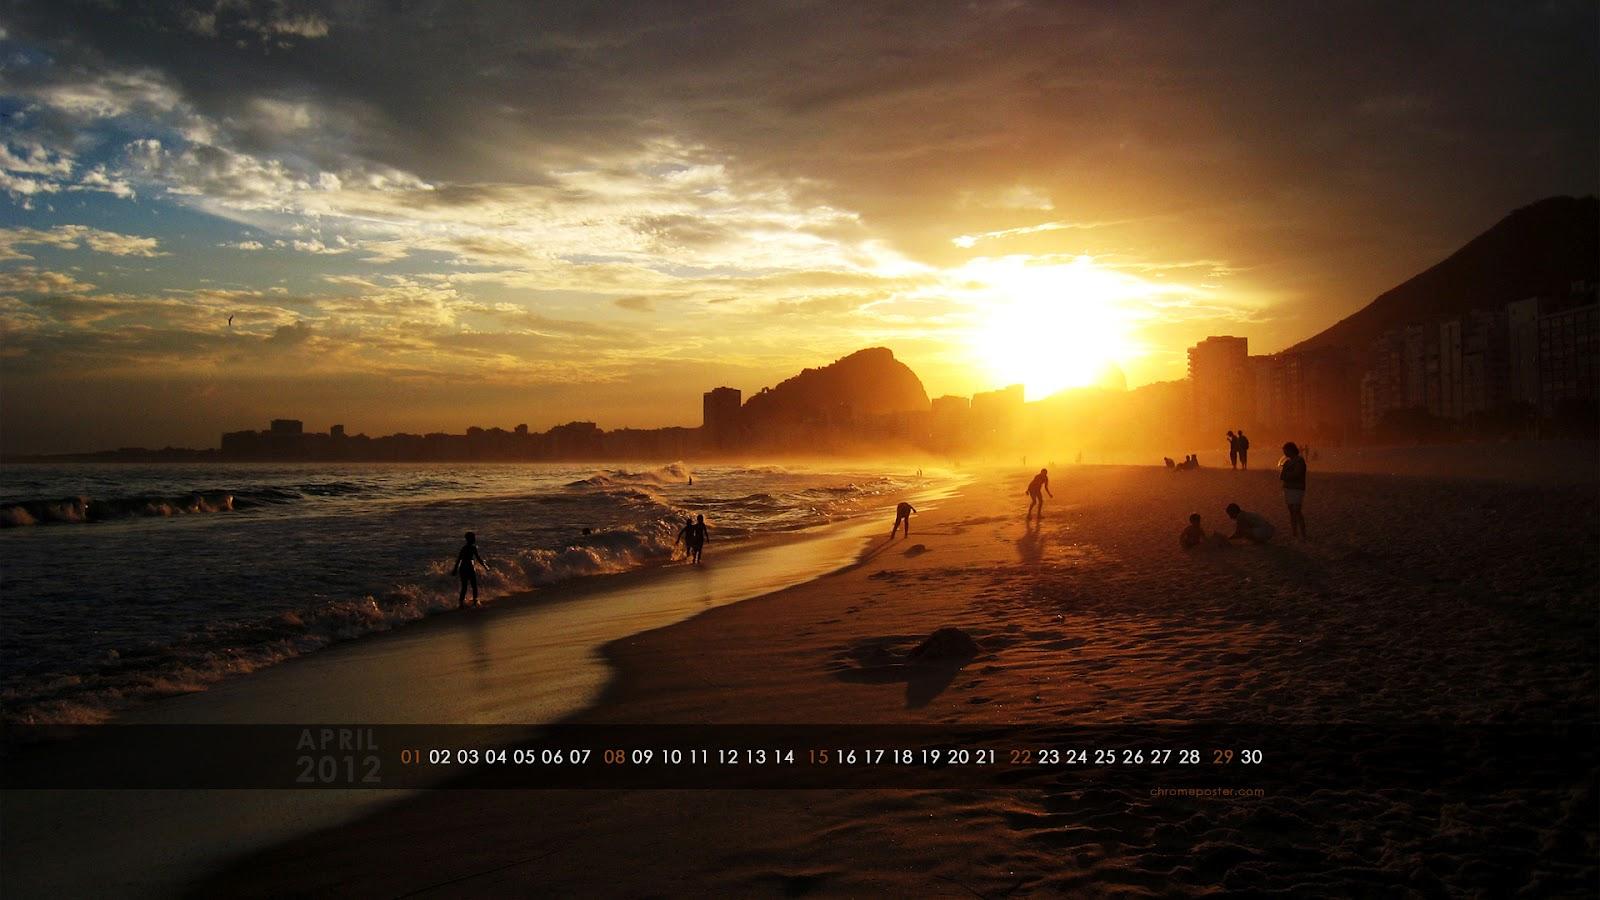 https://2.bp.blogspot.com/-ePukmXoJyVE/T3SLenuLiyI/AAAAAAAAGhs/Syt-mSG1QJk/s1600/beach-1920-x-1080.jpg